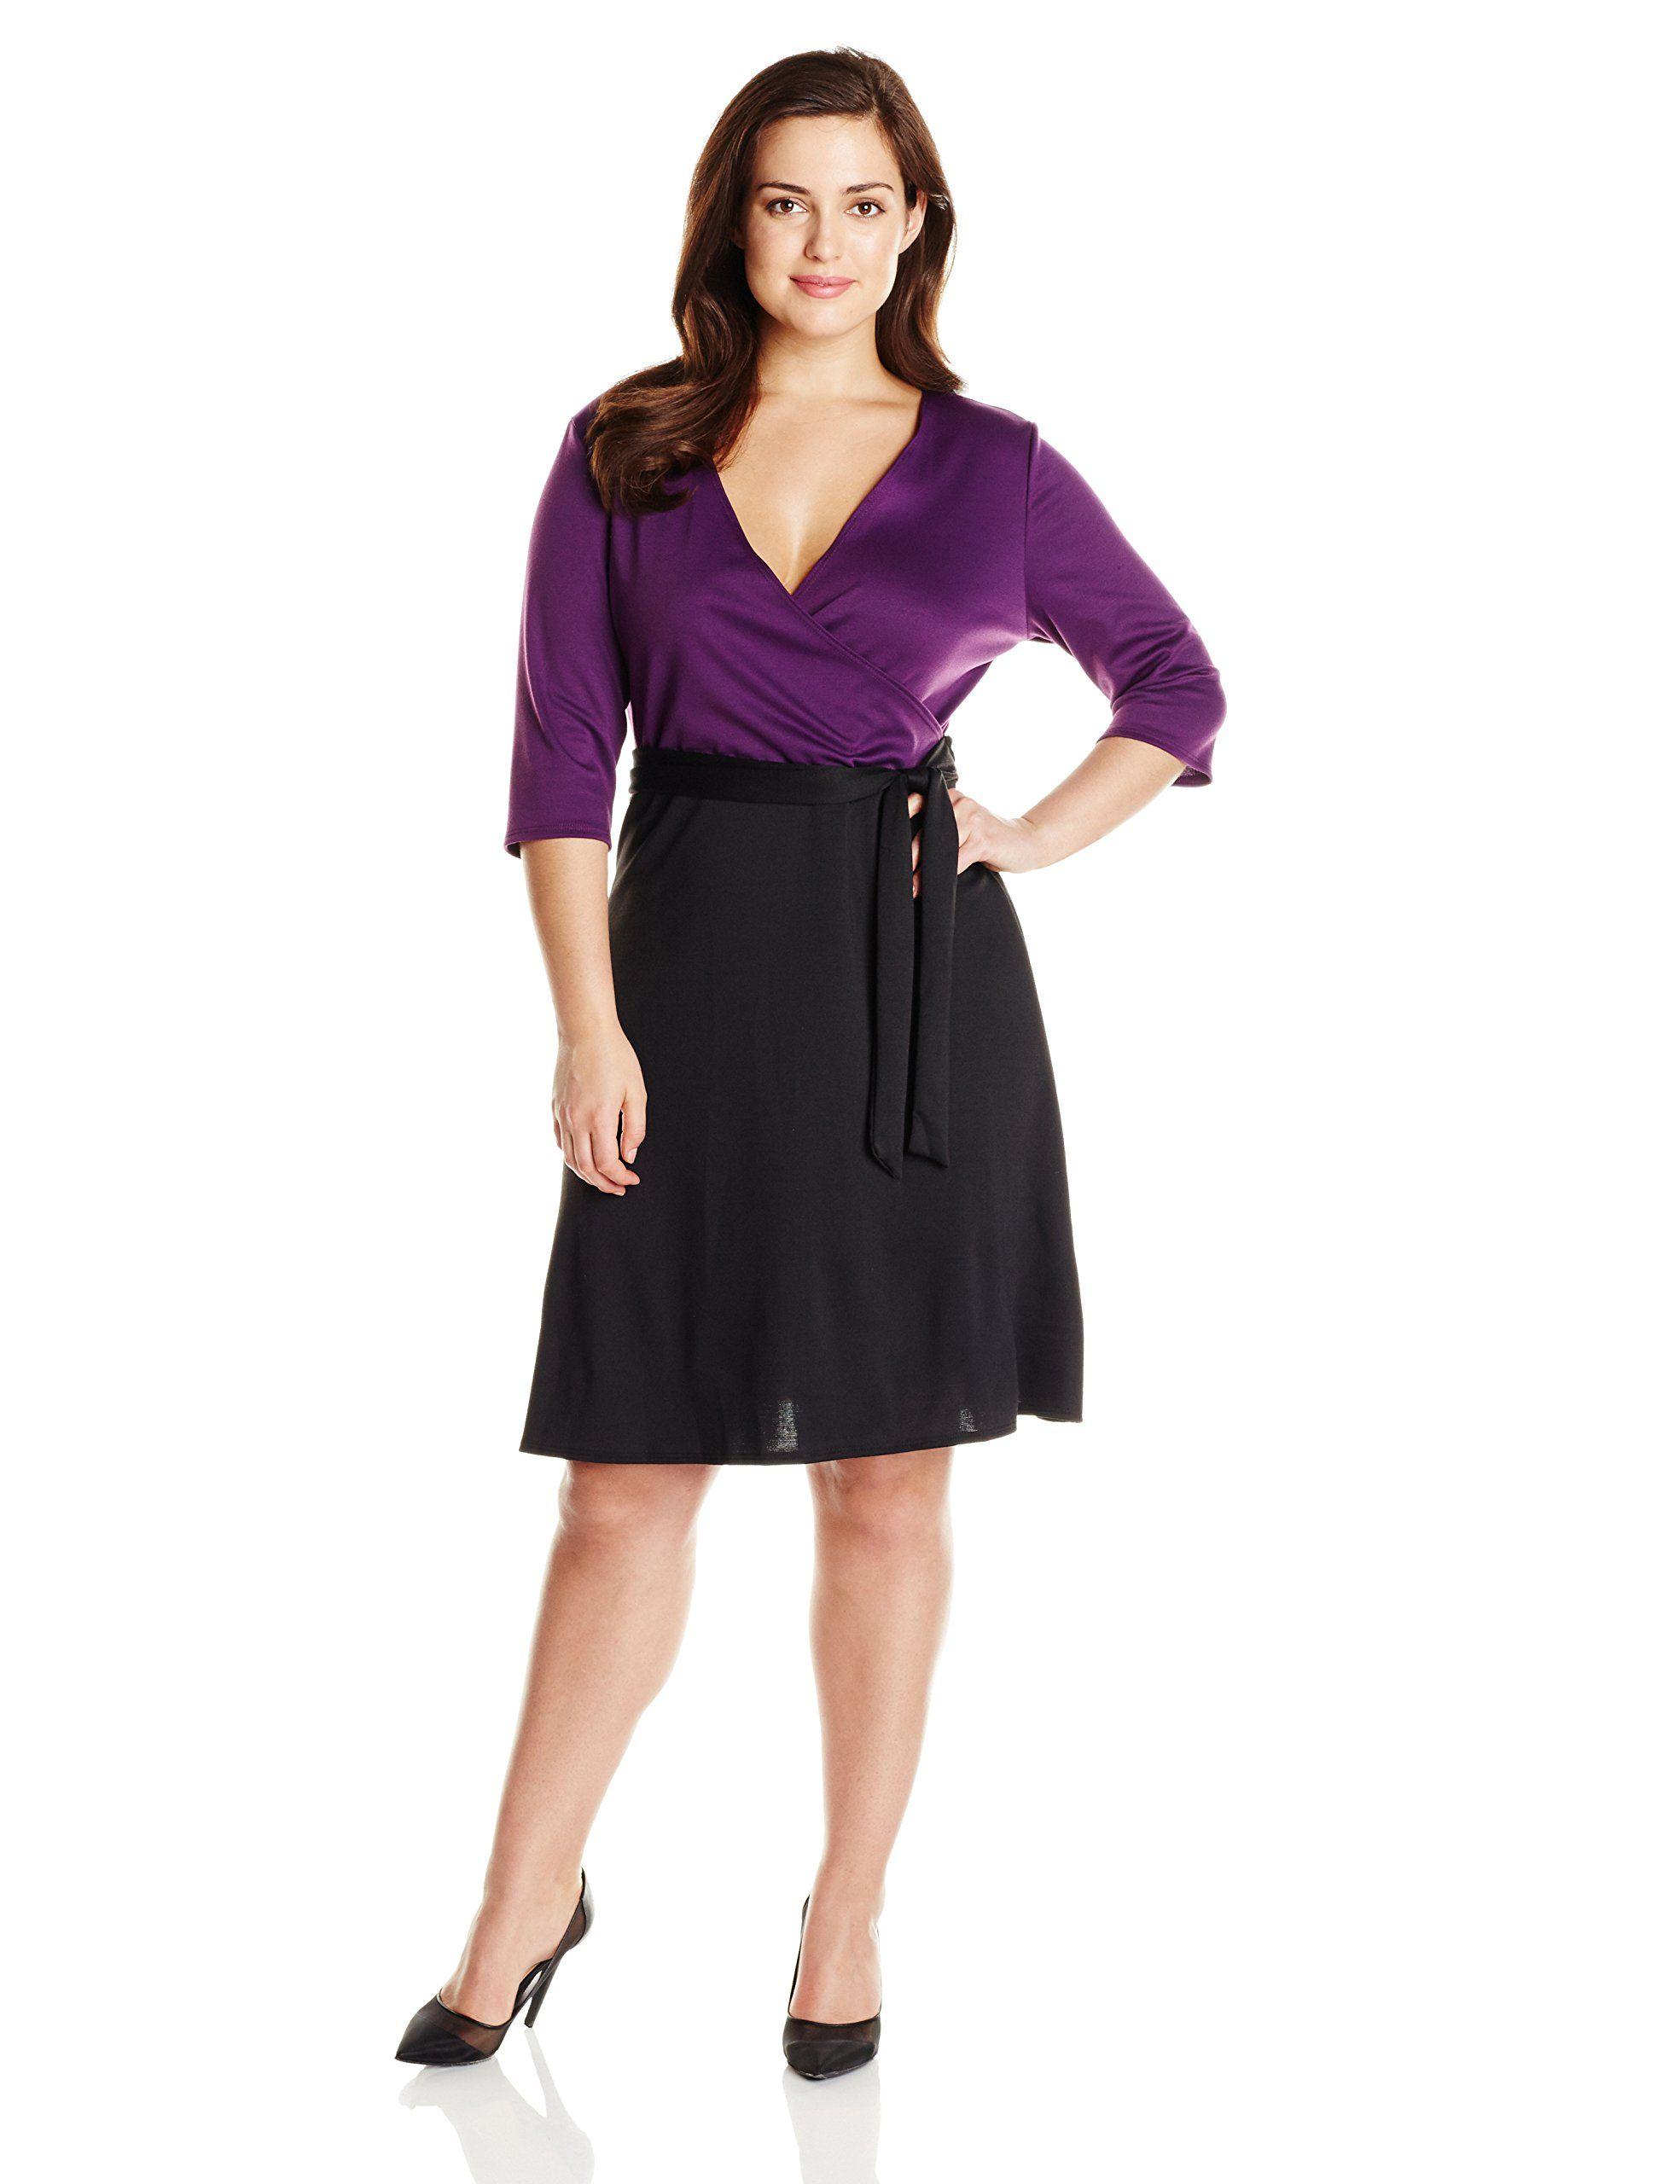 65f3d6b995e Star Vixen Women s Plus-Size Faux-Wrap Dress Black Skirt at Amazon Women s  Clothing store